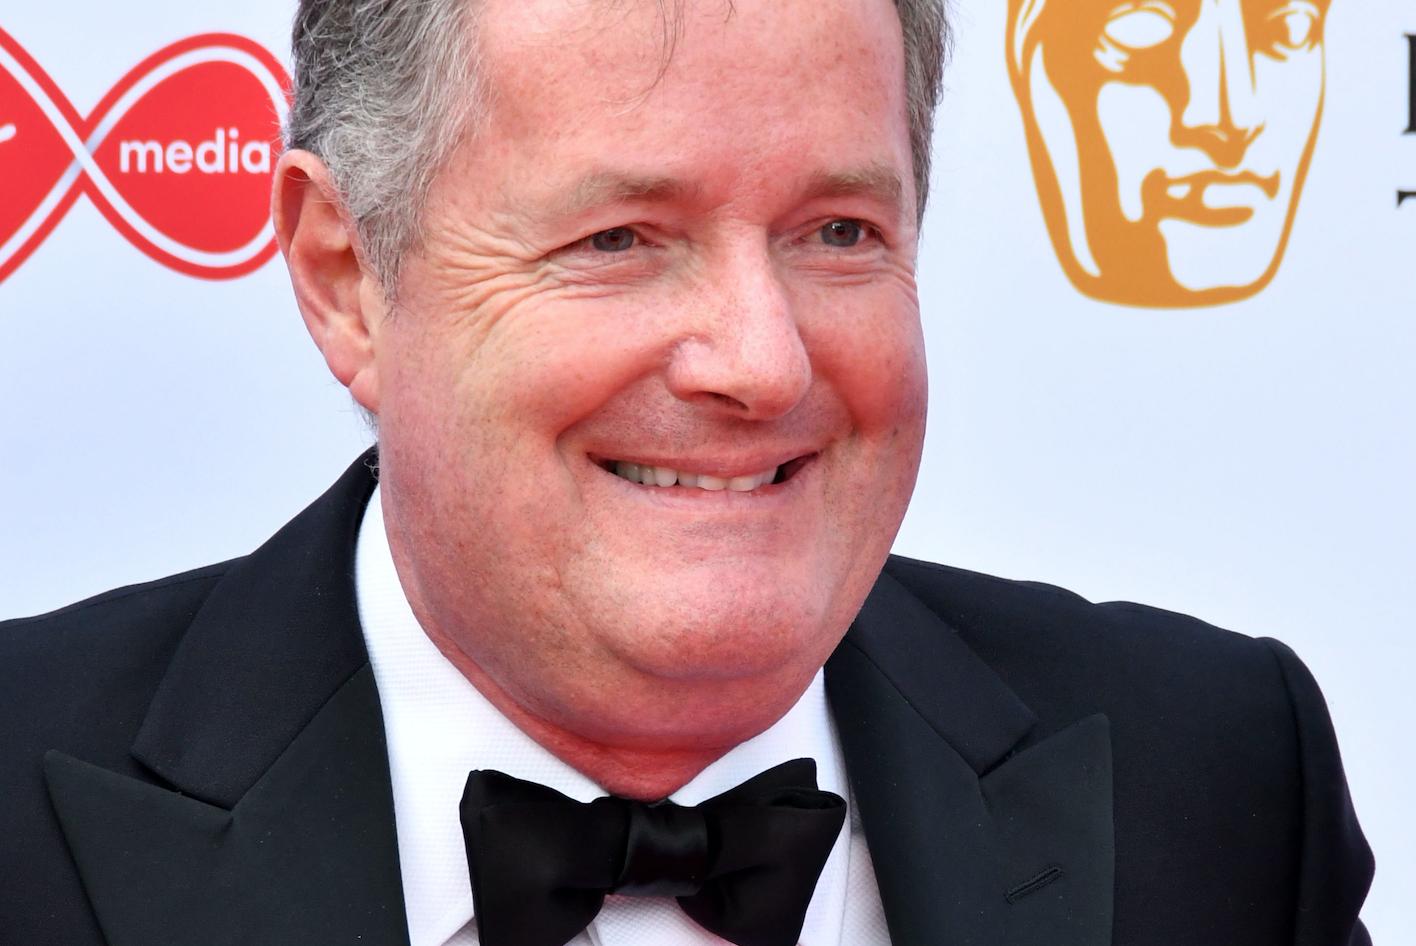 Piers Morgan slams 'selfish' MP for breaking lockdown rules